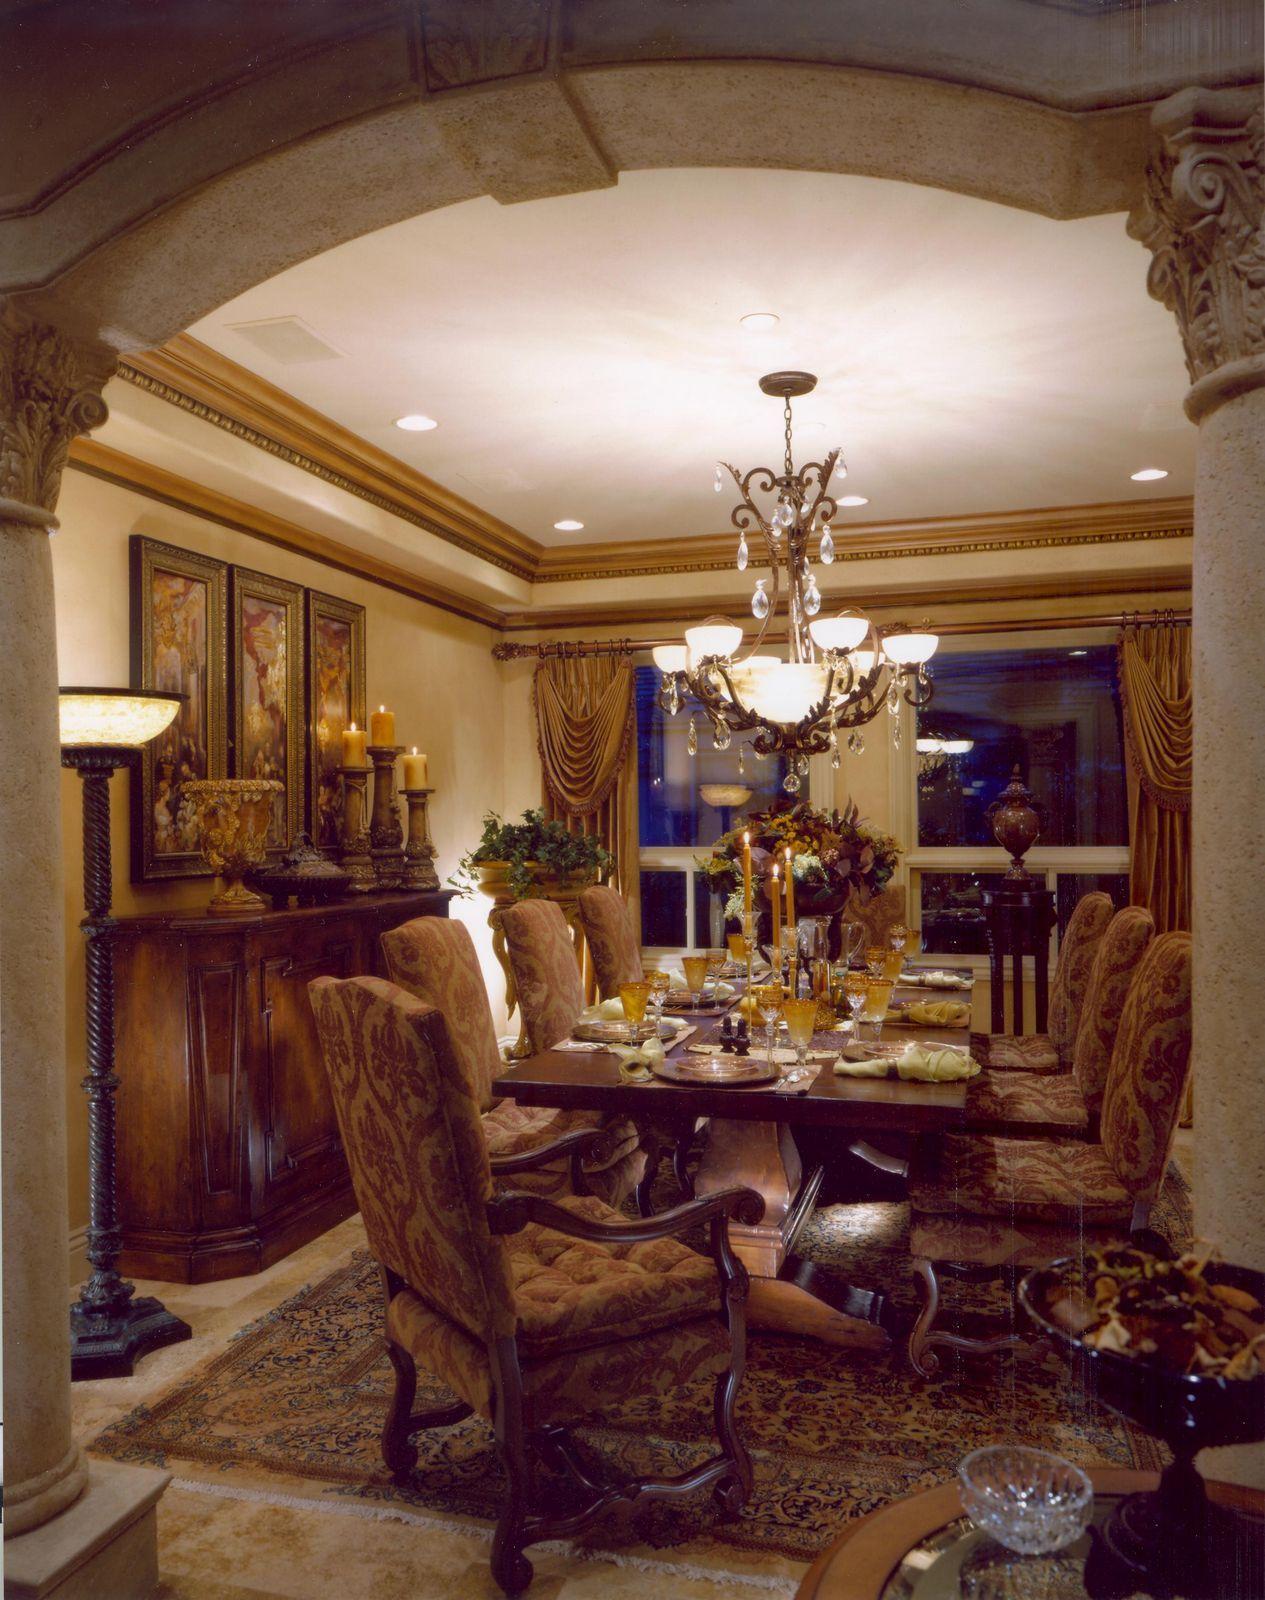 Rustic Elegant Tuscan Dining Room Tuscan Dining Rooms Dining Room Design Elegant Dining Room